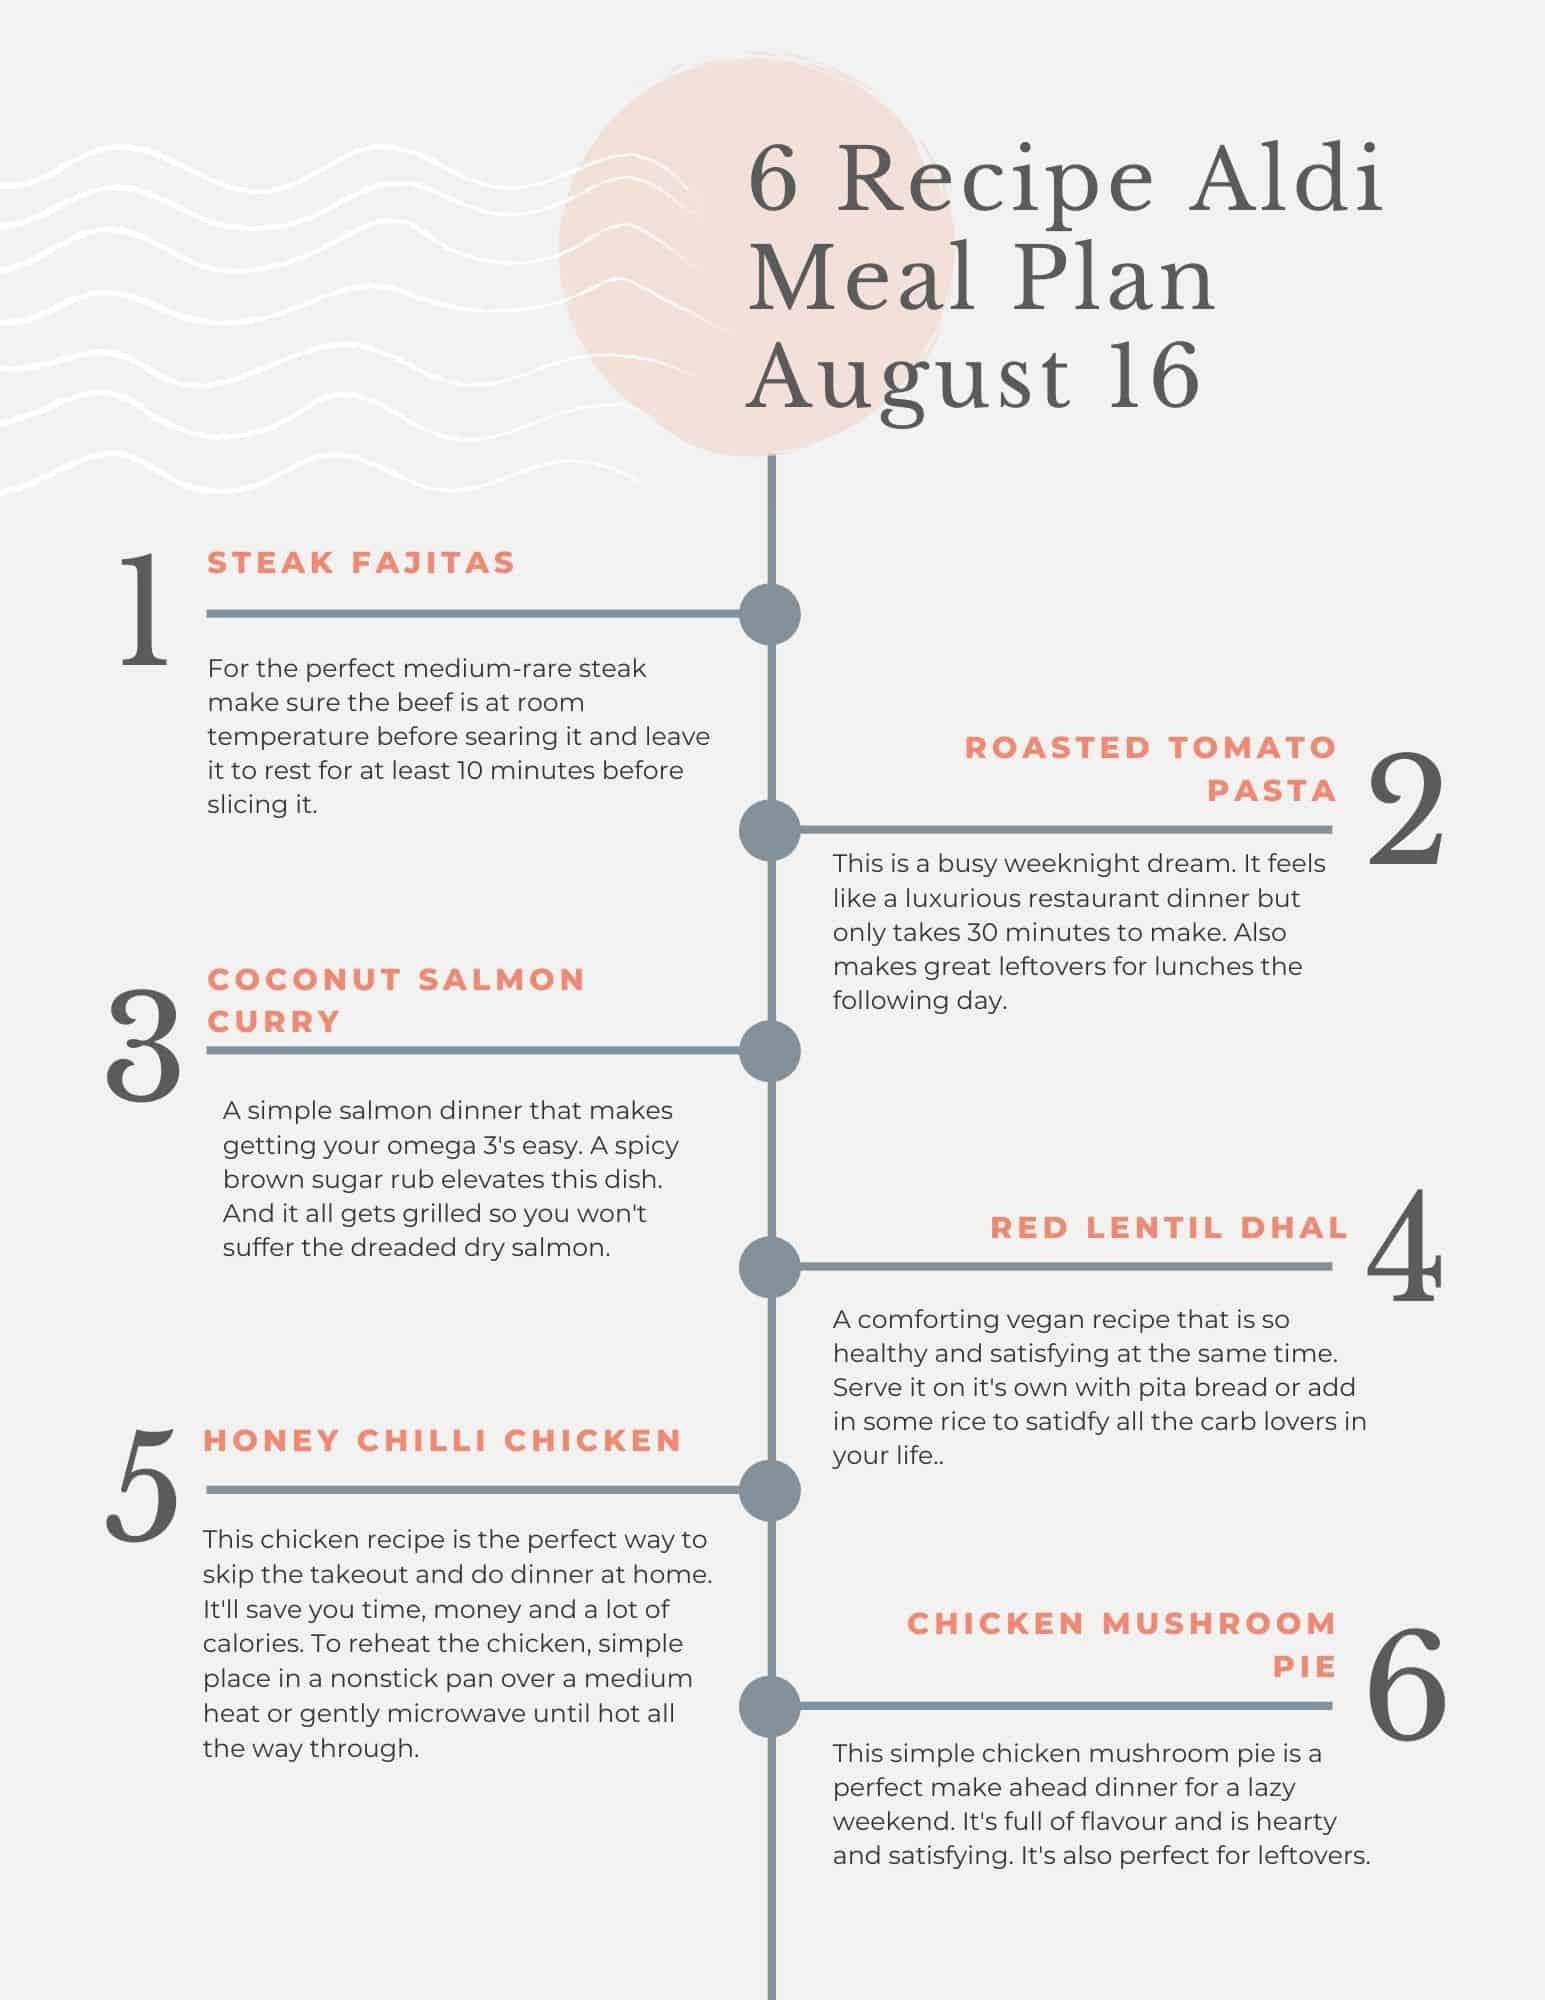 Aldi meal plan printout